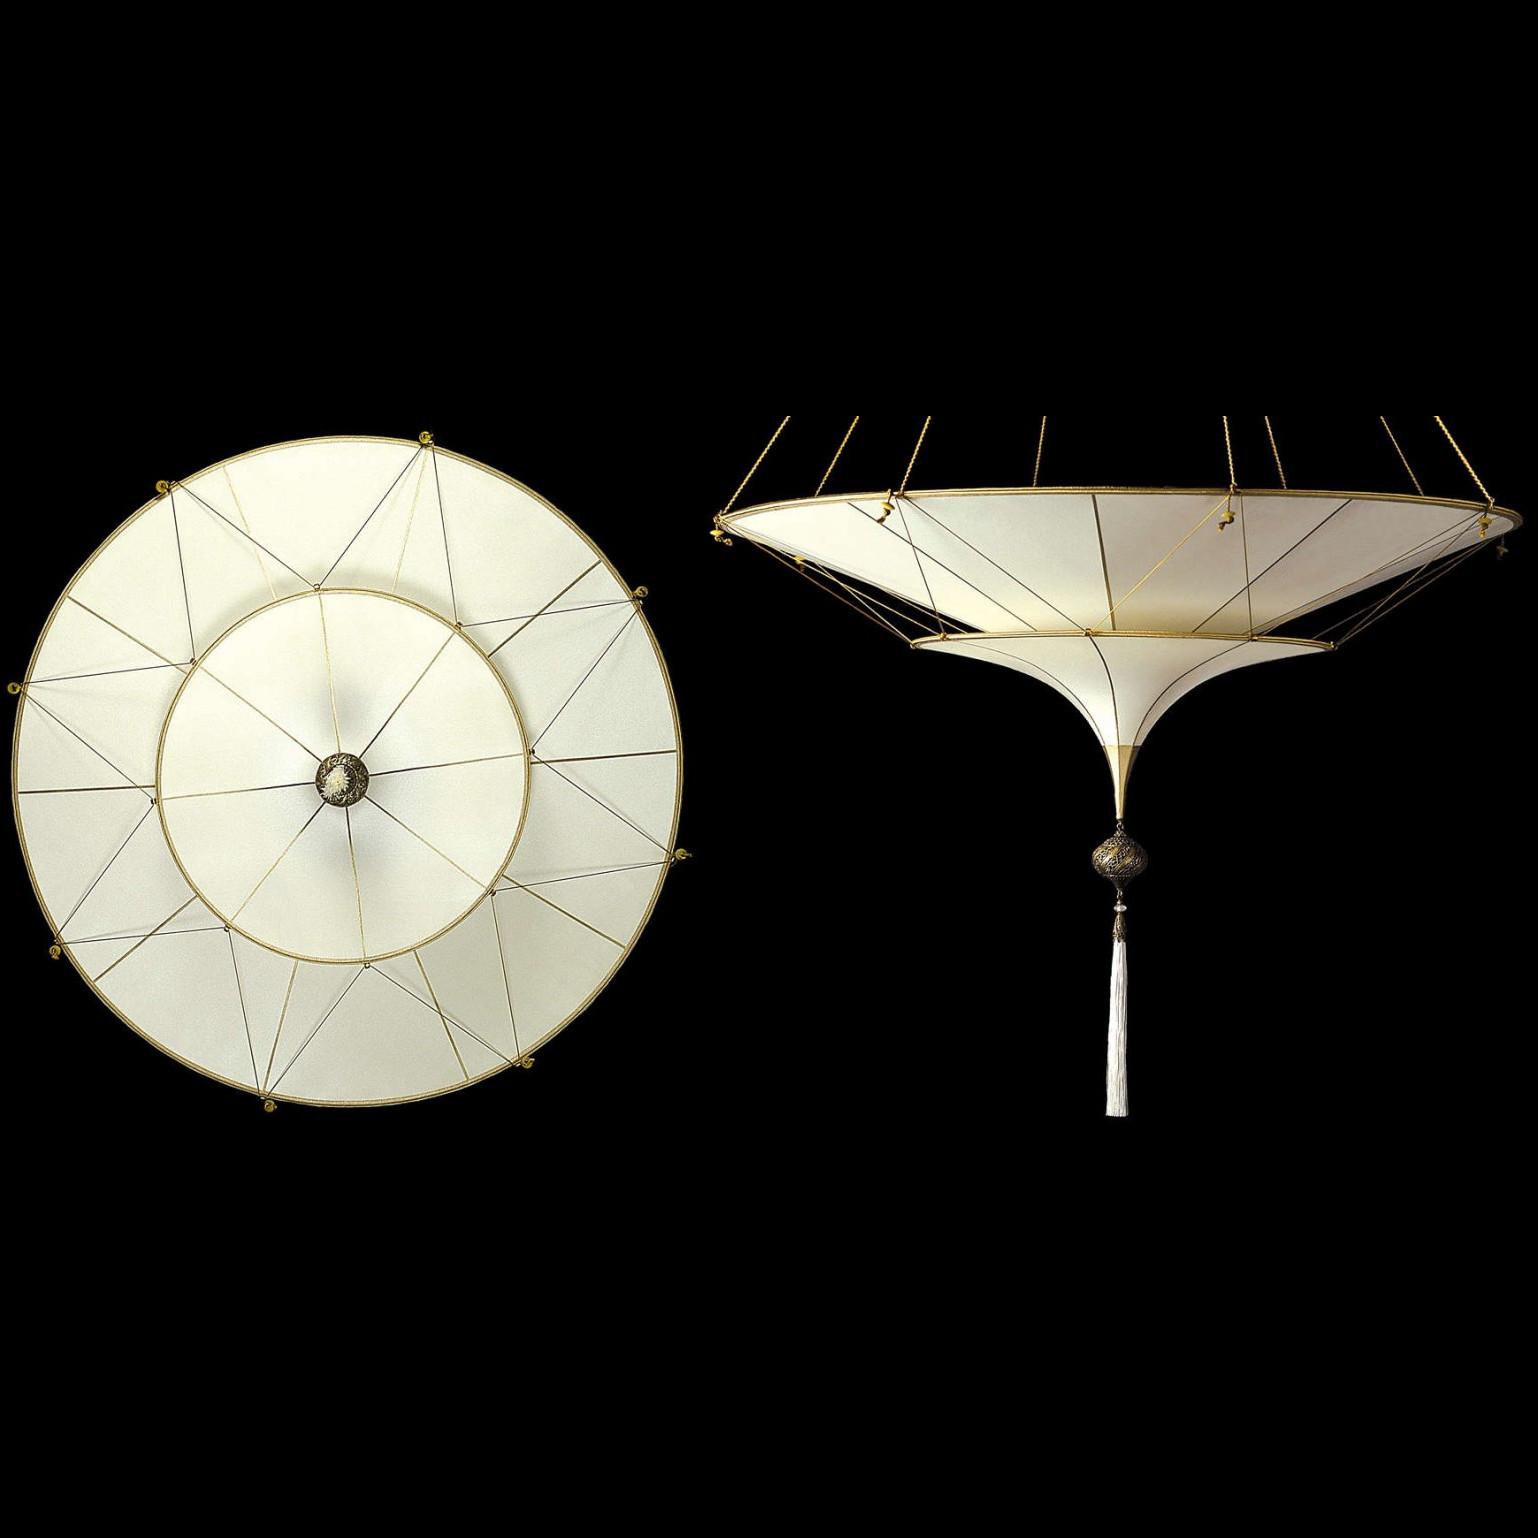 francisco san garbo design chandelier s fortunys center fortuny copia